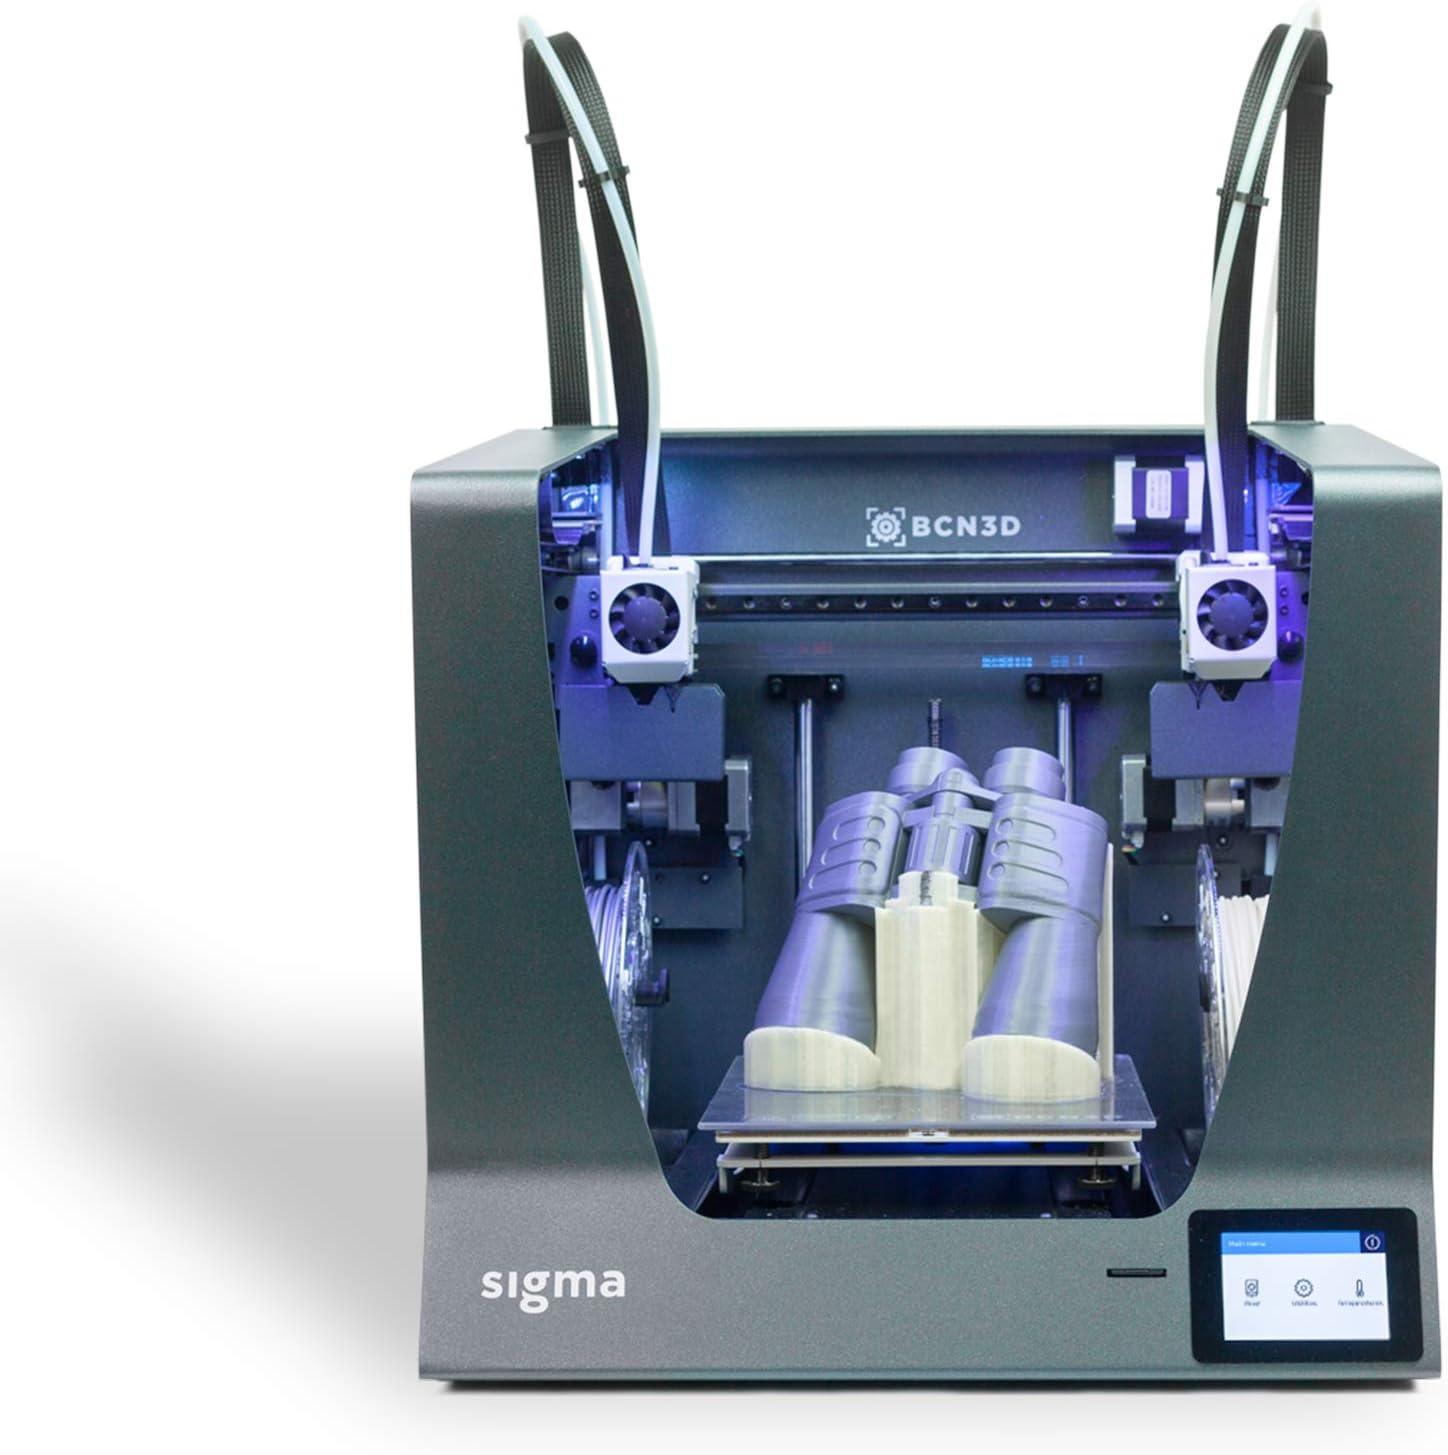 BCN3D Technologies Sigma R19: Amazon.es: Informática